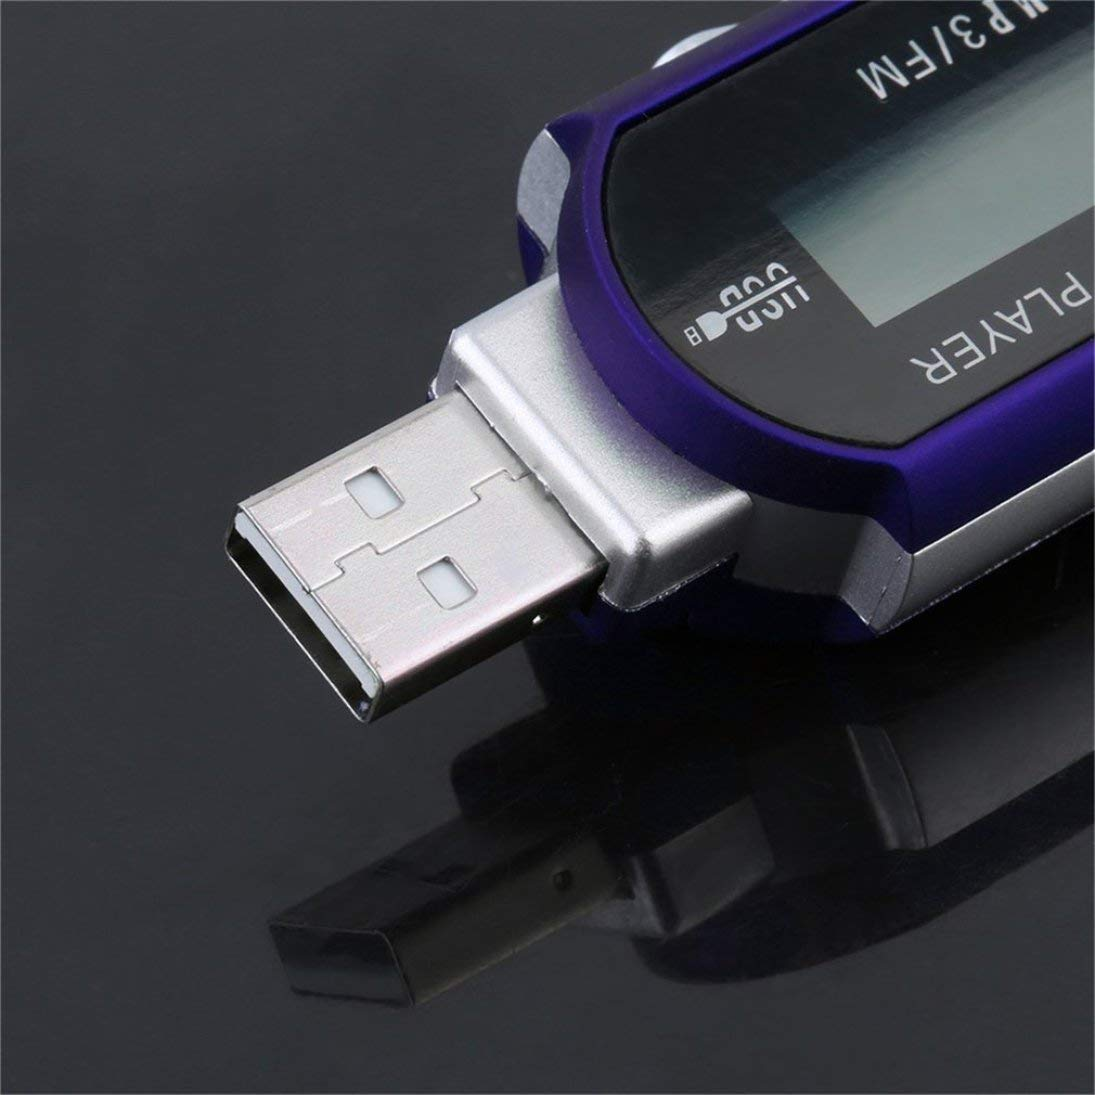 Mini USB 2.0 Unidad flash Transferencia de alta velocidad Pantalla LCD Reproductor de m/úsica MP3 Luz de fondo en LCD Proporciona una pantalla clara ToGames